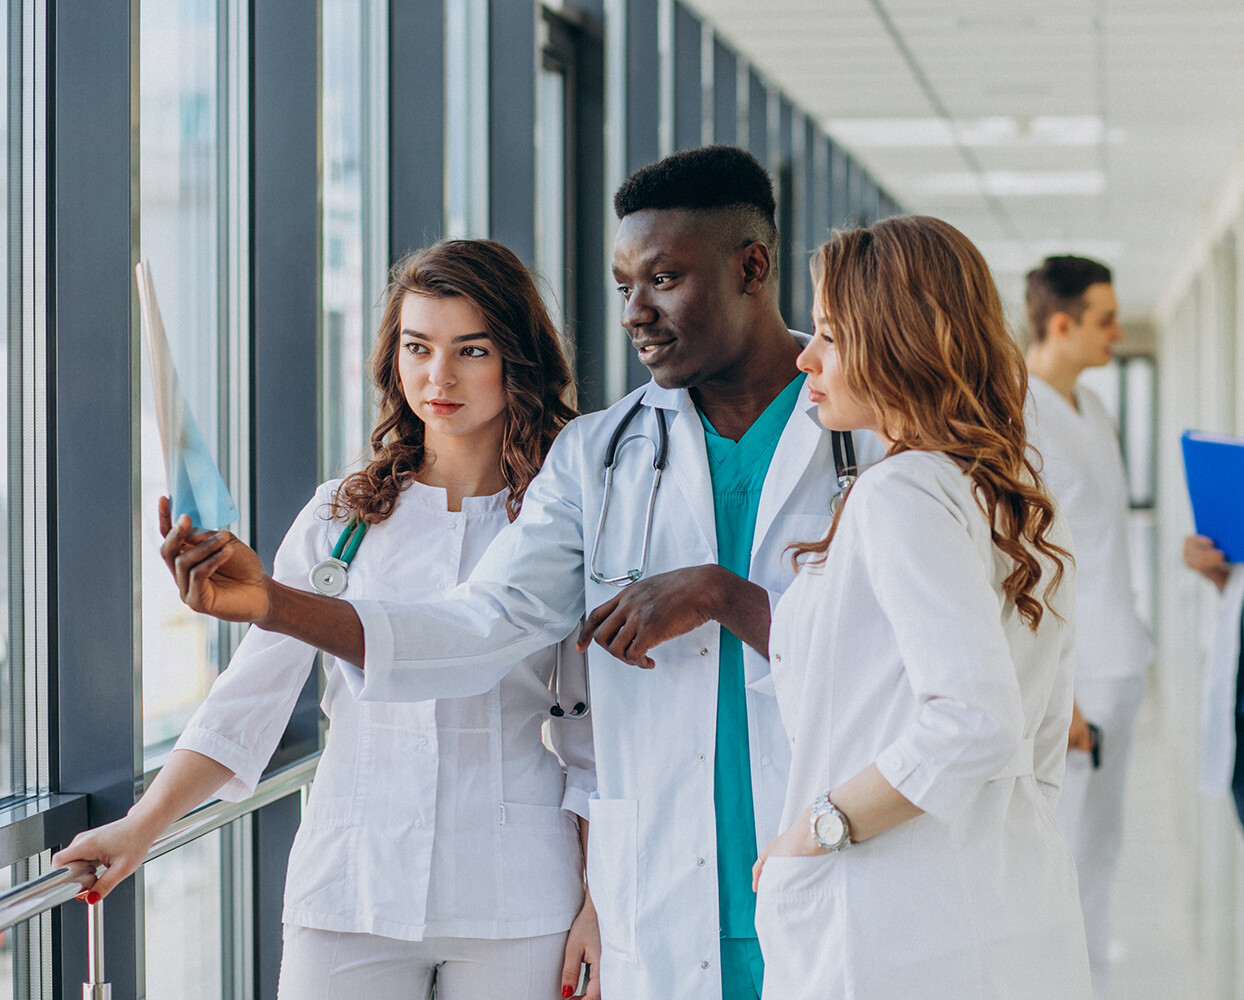 Surgeons looking at xrays